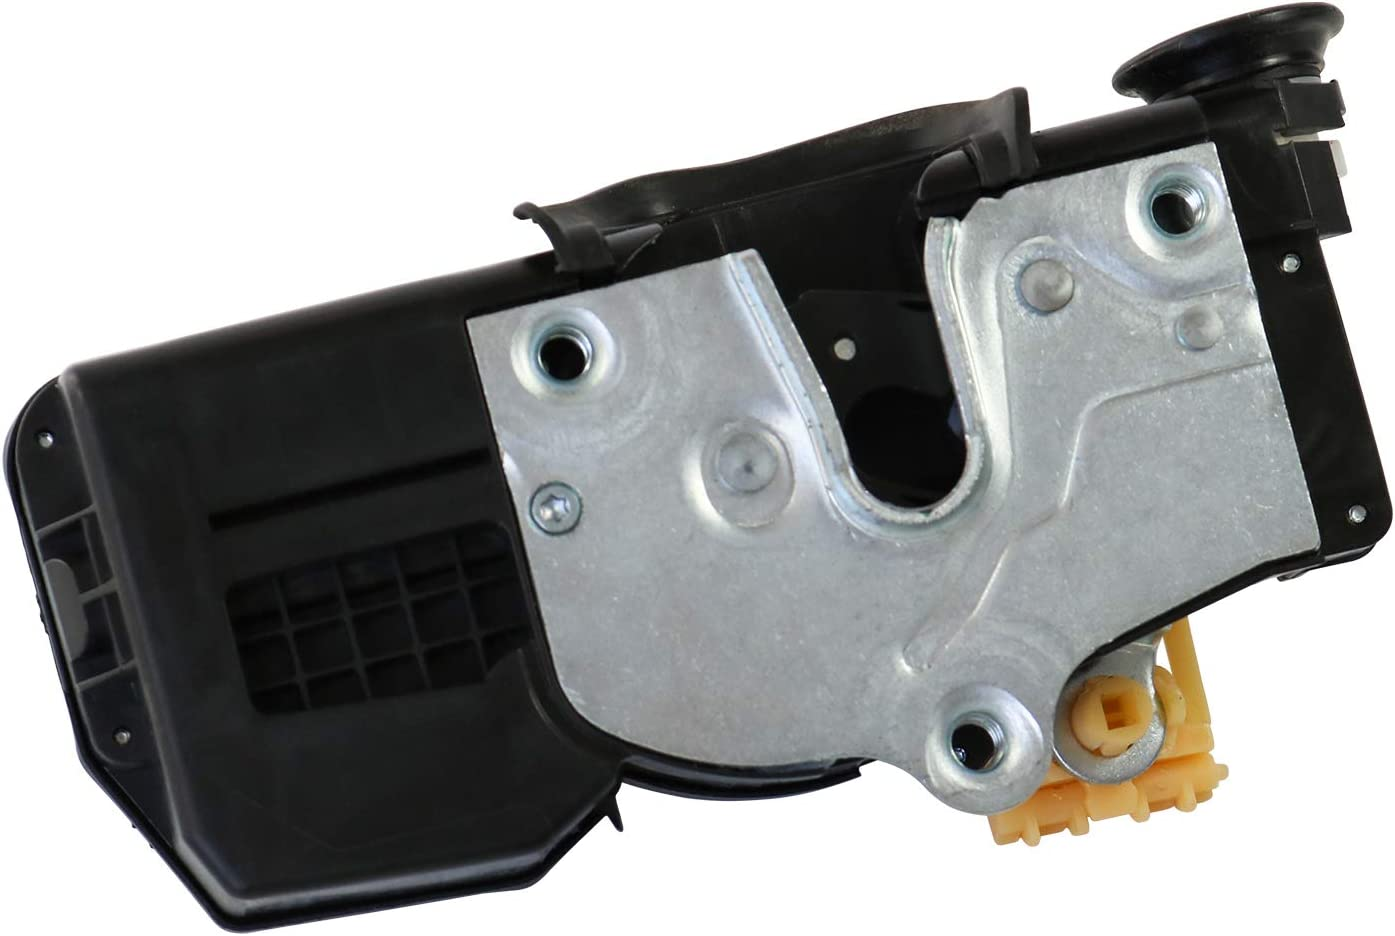 JDMSPEED New Rear Left Sales of SALE items from new works Power price Door Lock 931-108 Actuator Re Motor